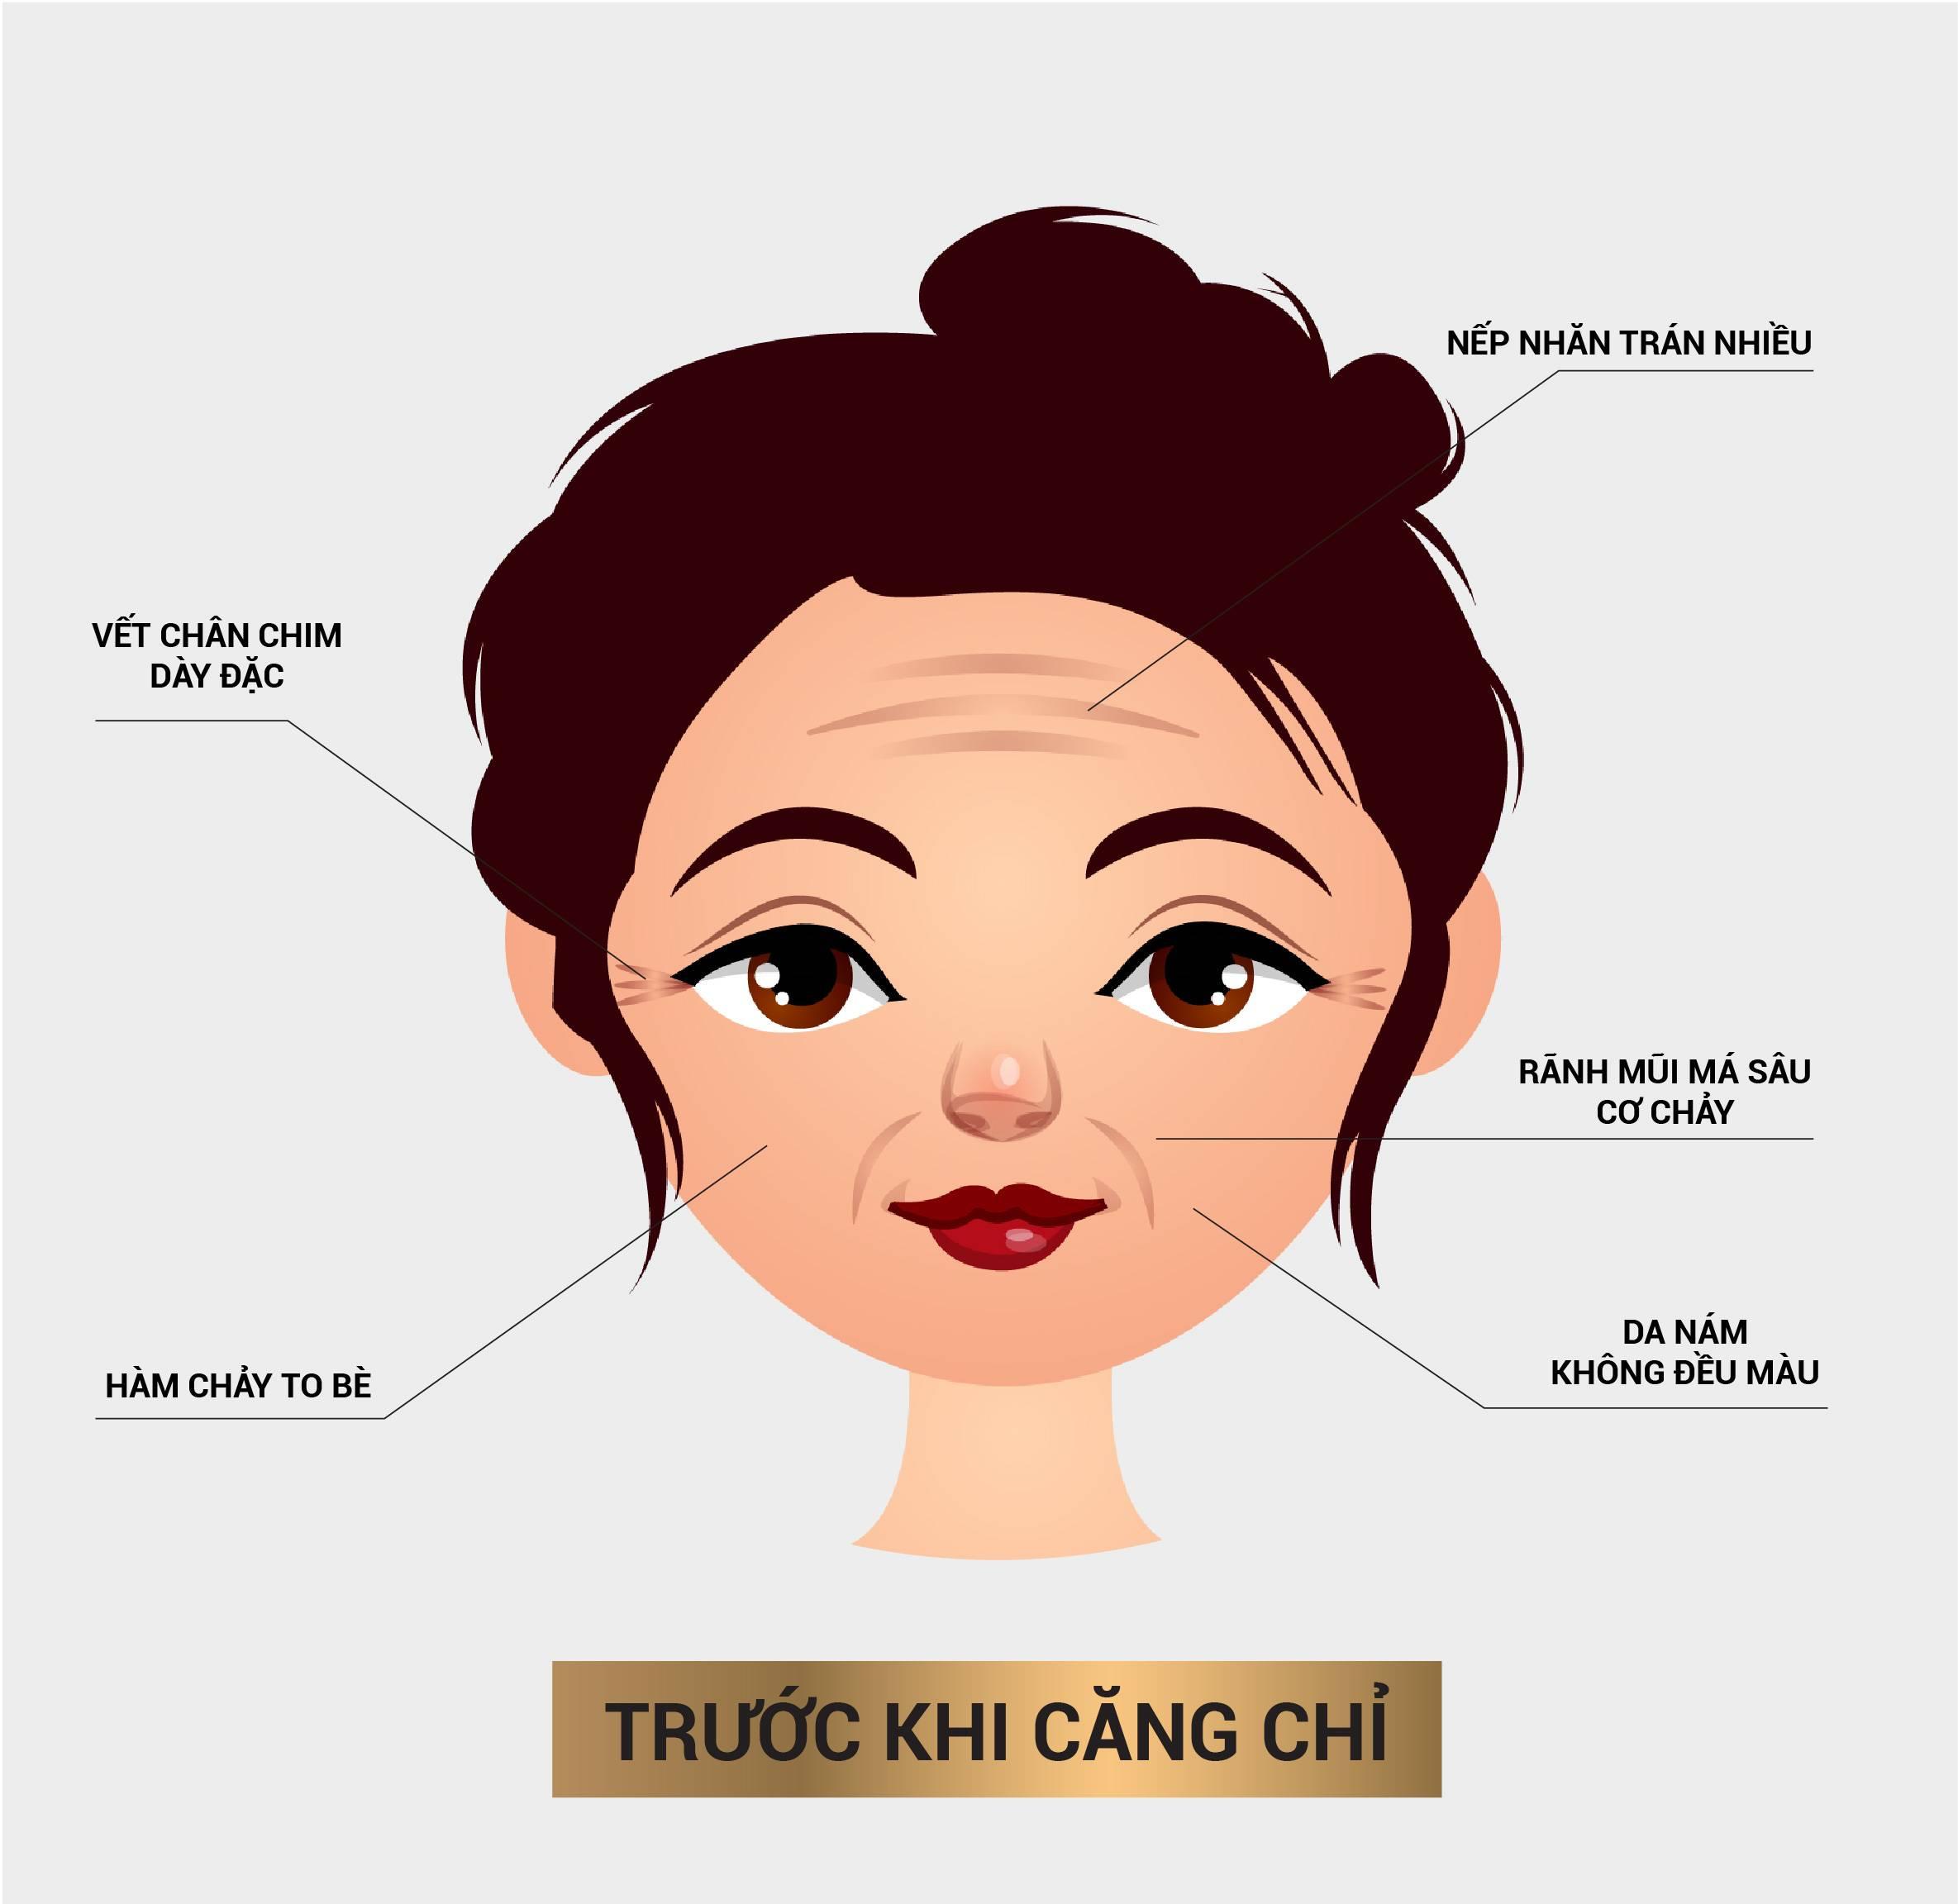 ladi-page-cang-chi-gangnam-qua-trinh-cang-chi